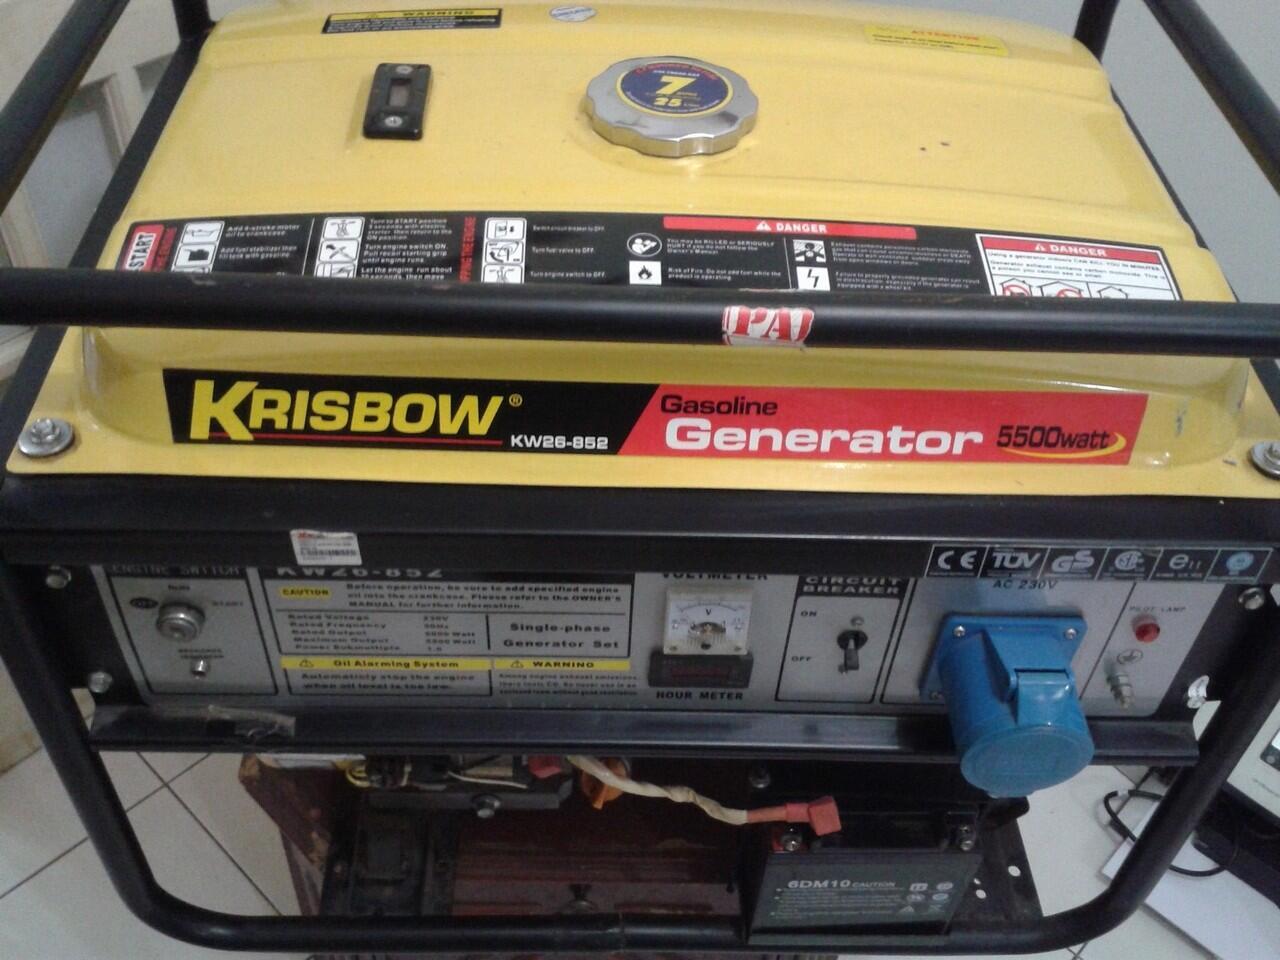 Jual CEPAT !!! GENSET KRISBOW 5500 Watt Kw26-852